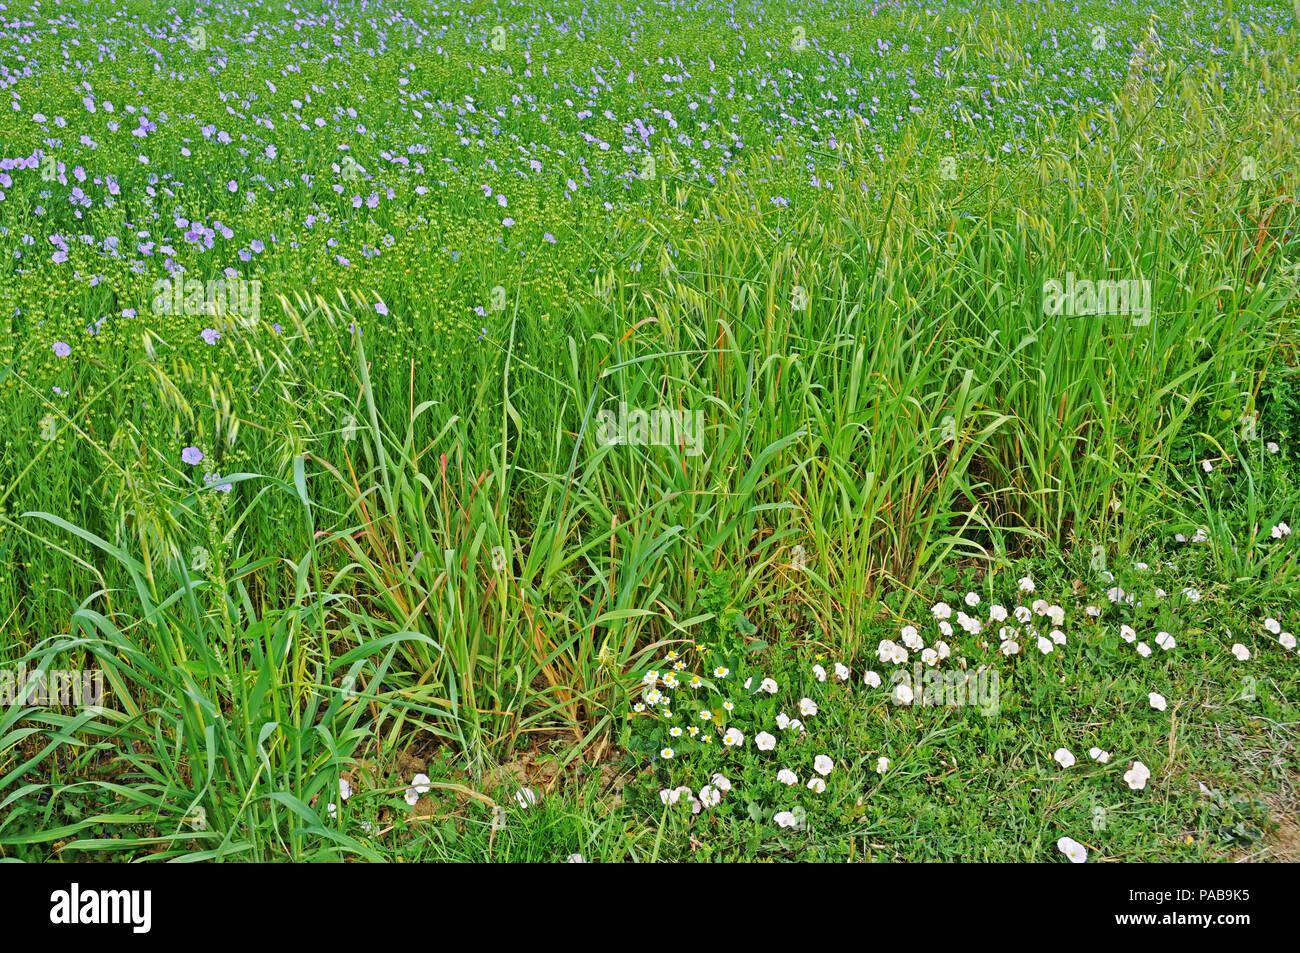 Field of Linseed in bloom.  Margins of oats, Avena fatua, and sea bindweed, Calystegia soldonella. Stock Photo